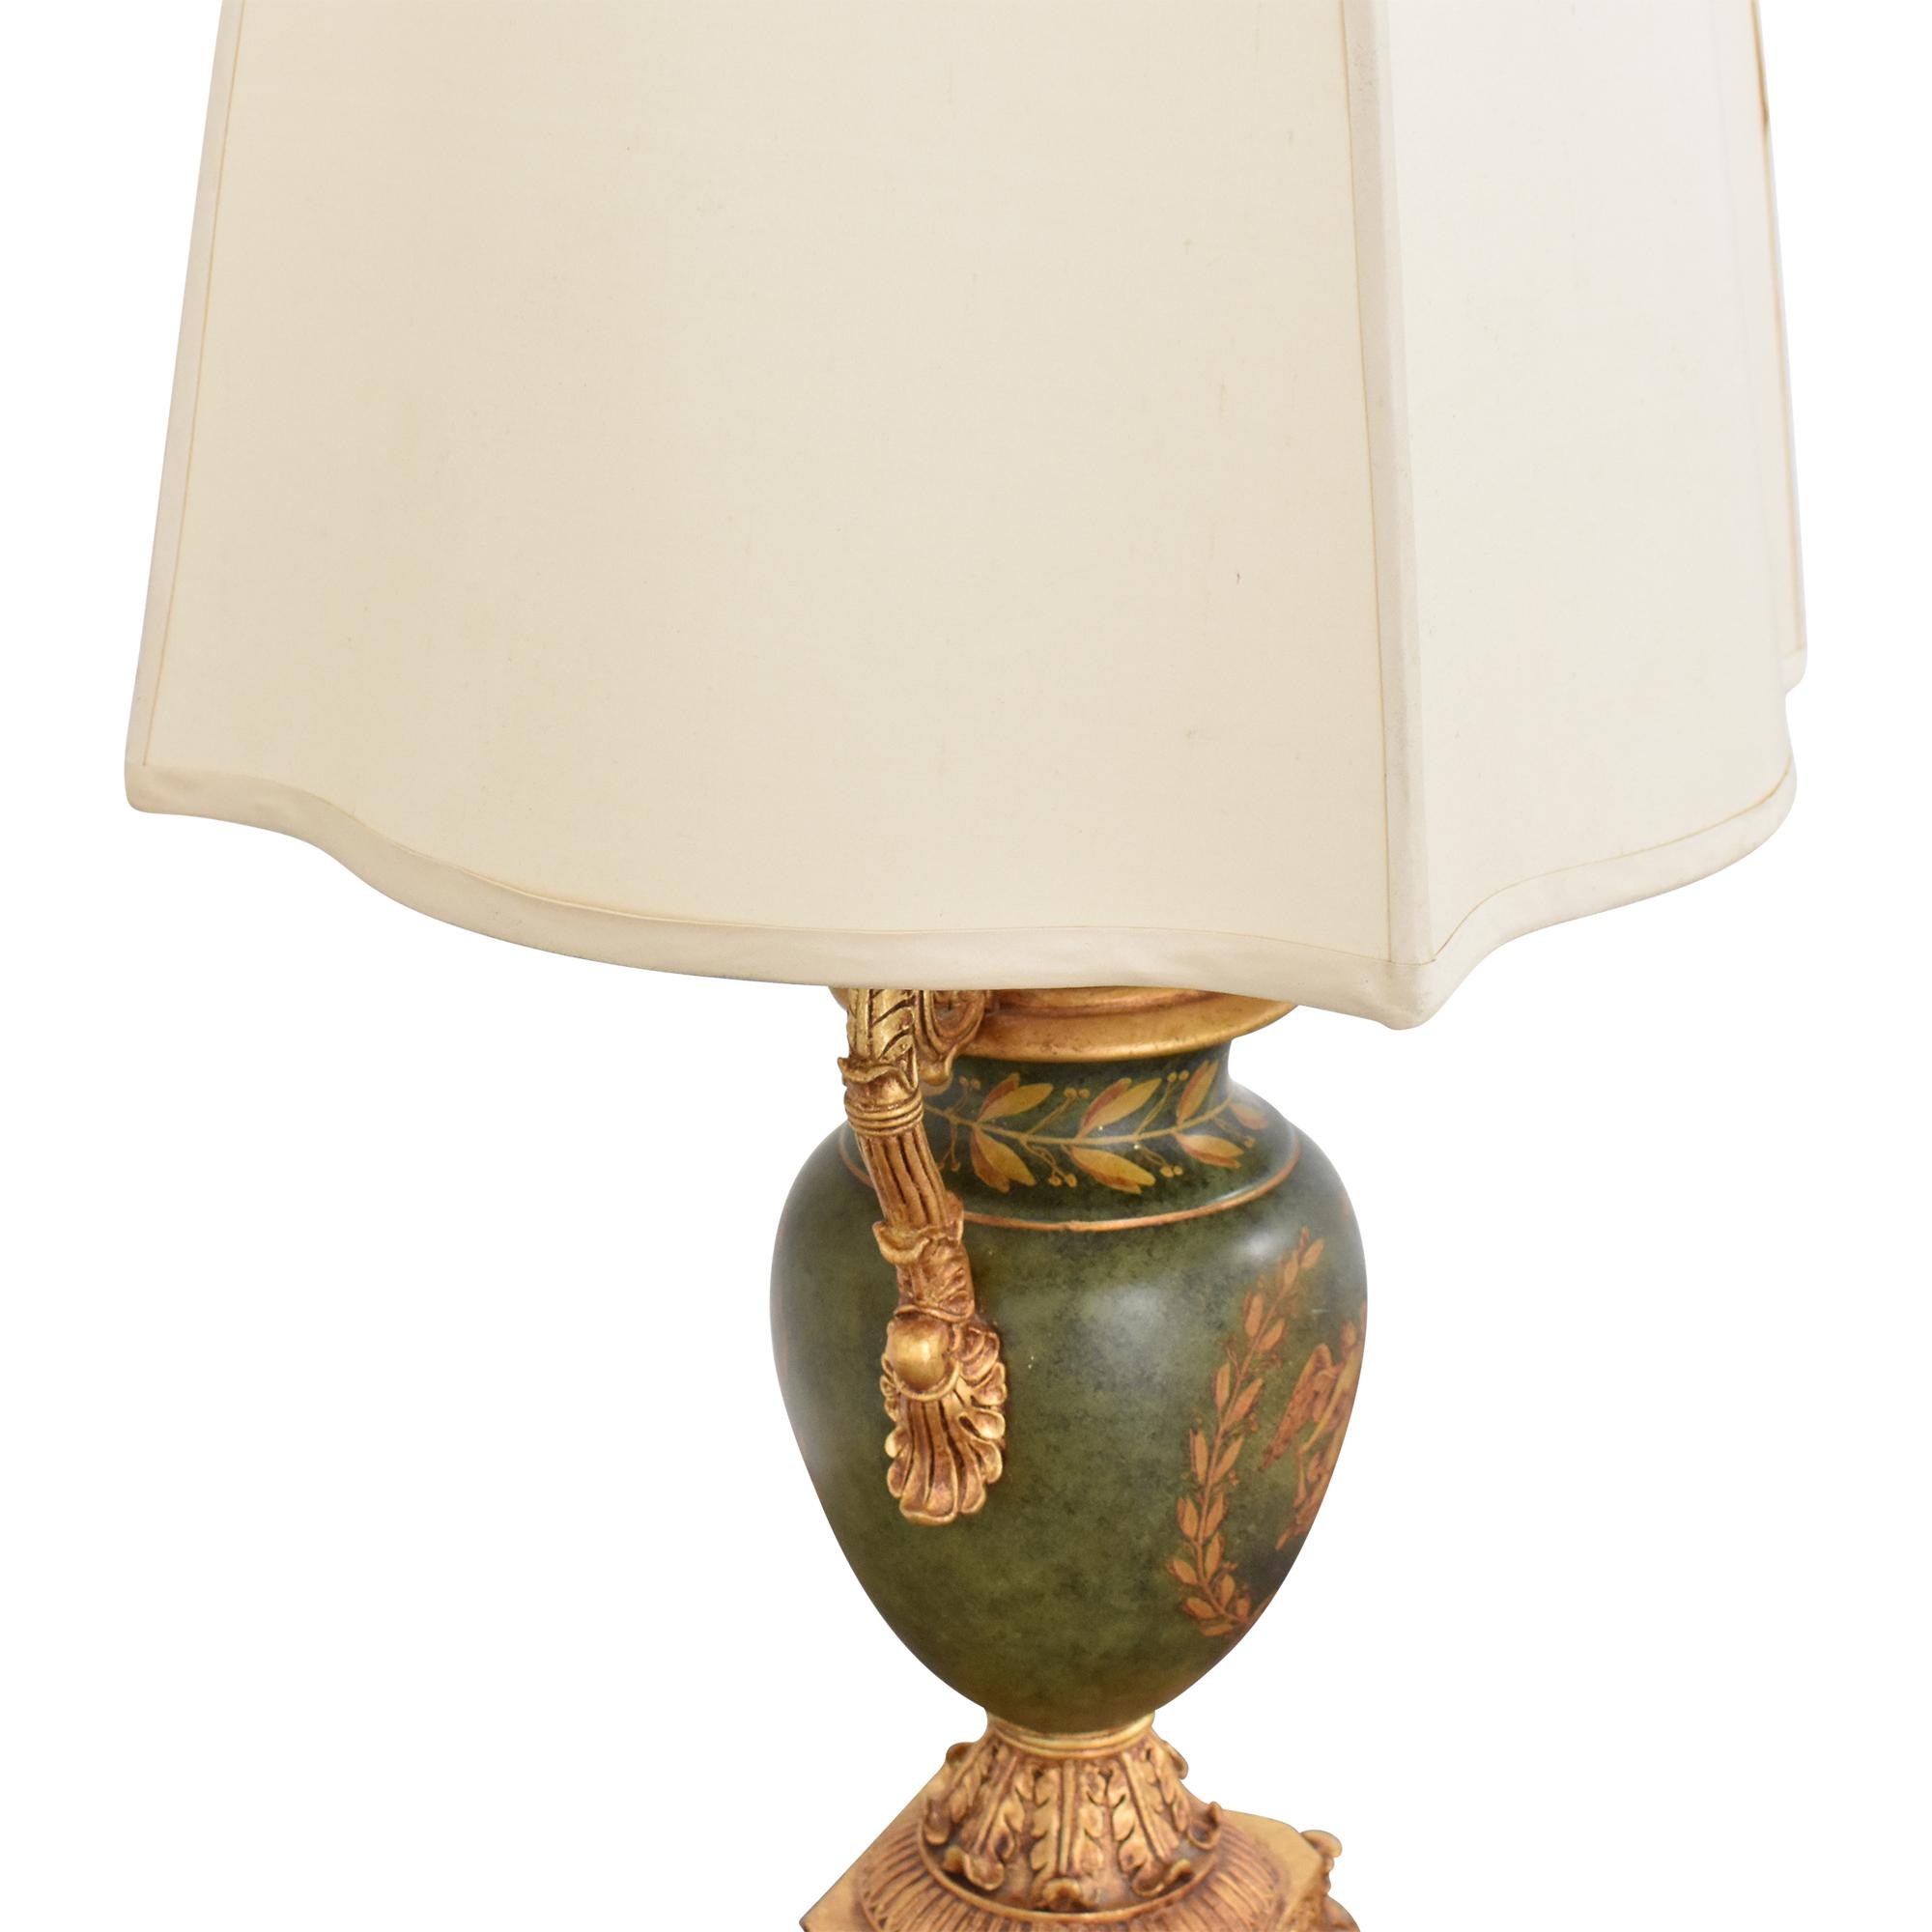 Frederick Cooper Frederick Cooper Urn Lamp used